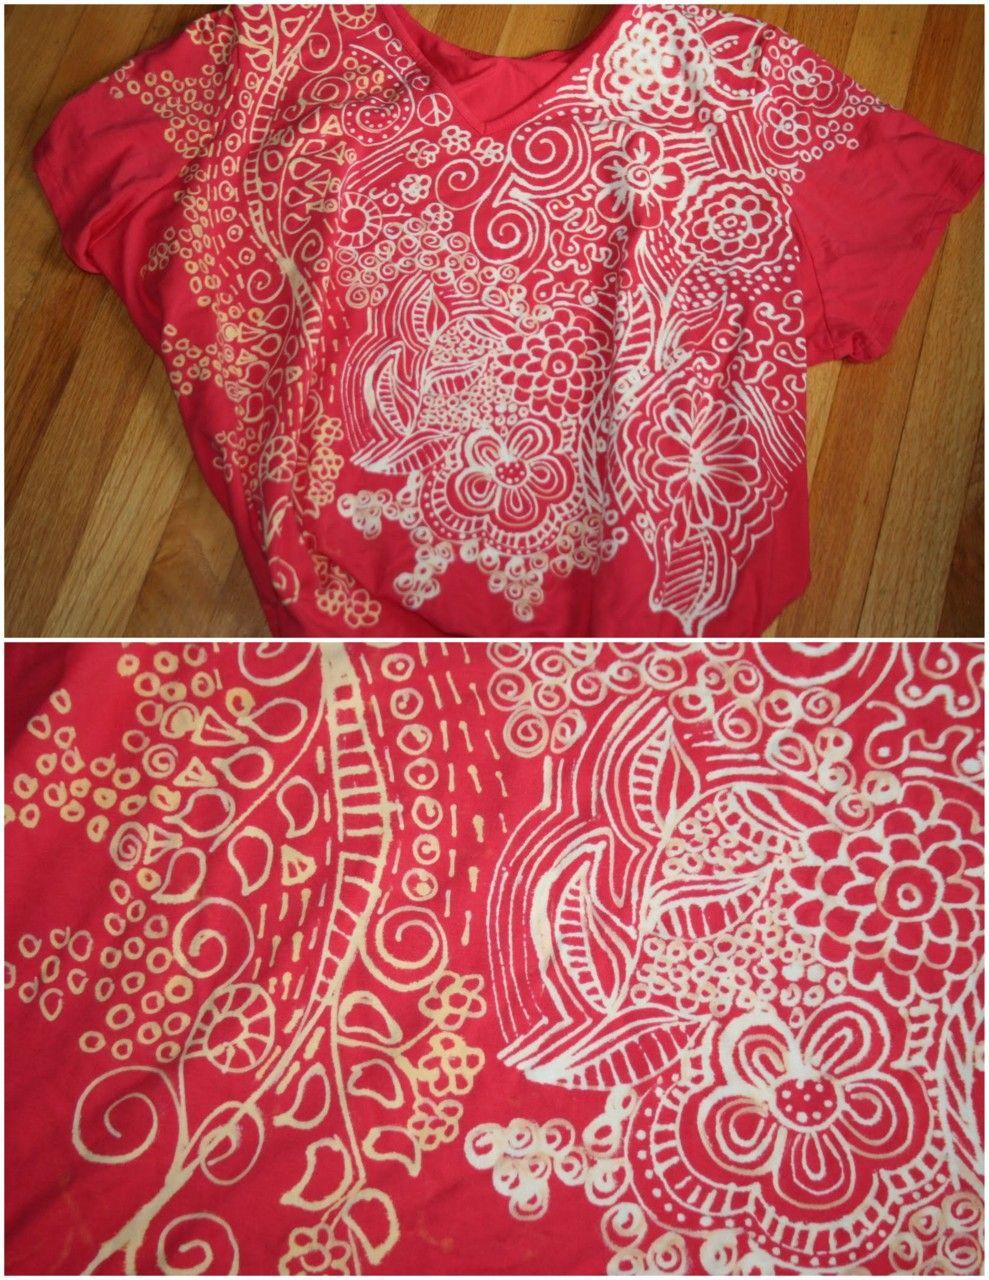 Shirt design using bleach - Diy Bleach Doodles T Shirt Using The Clorox Bleach Pen There Have Been Other